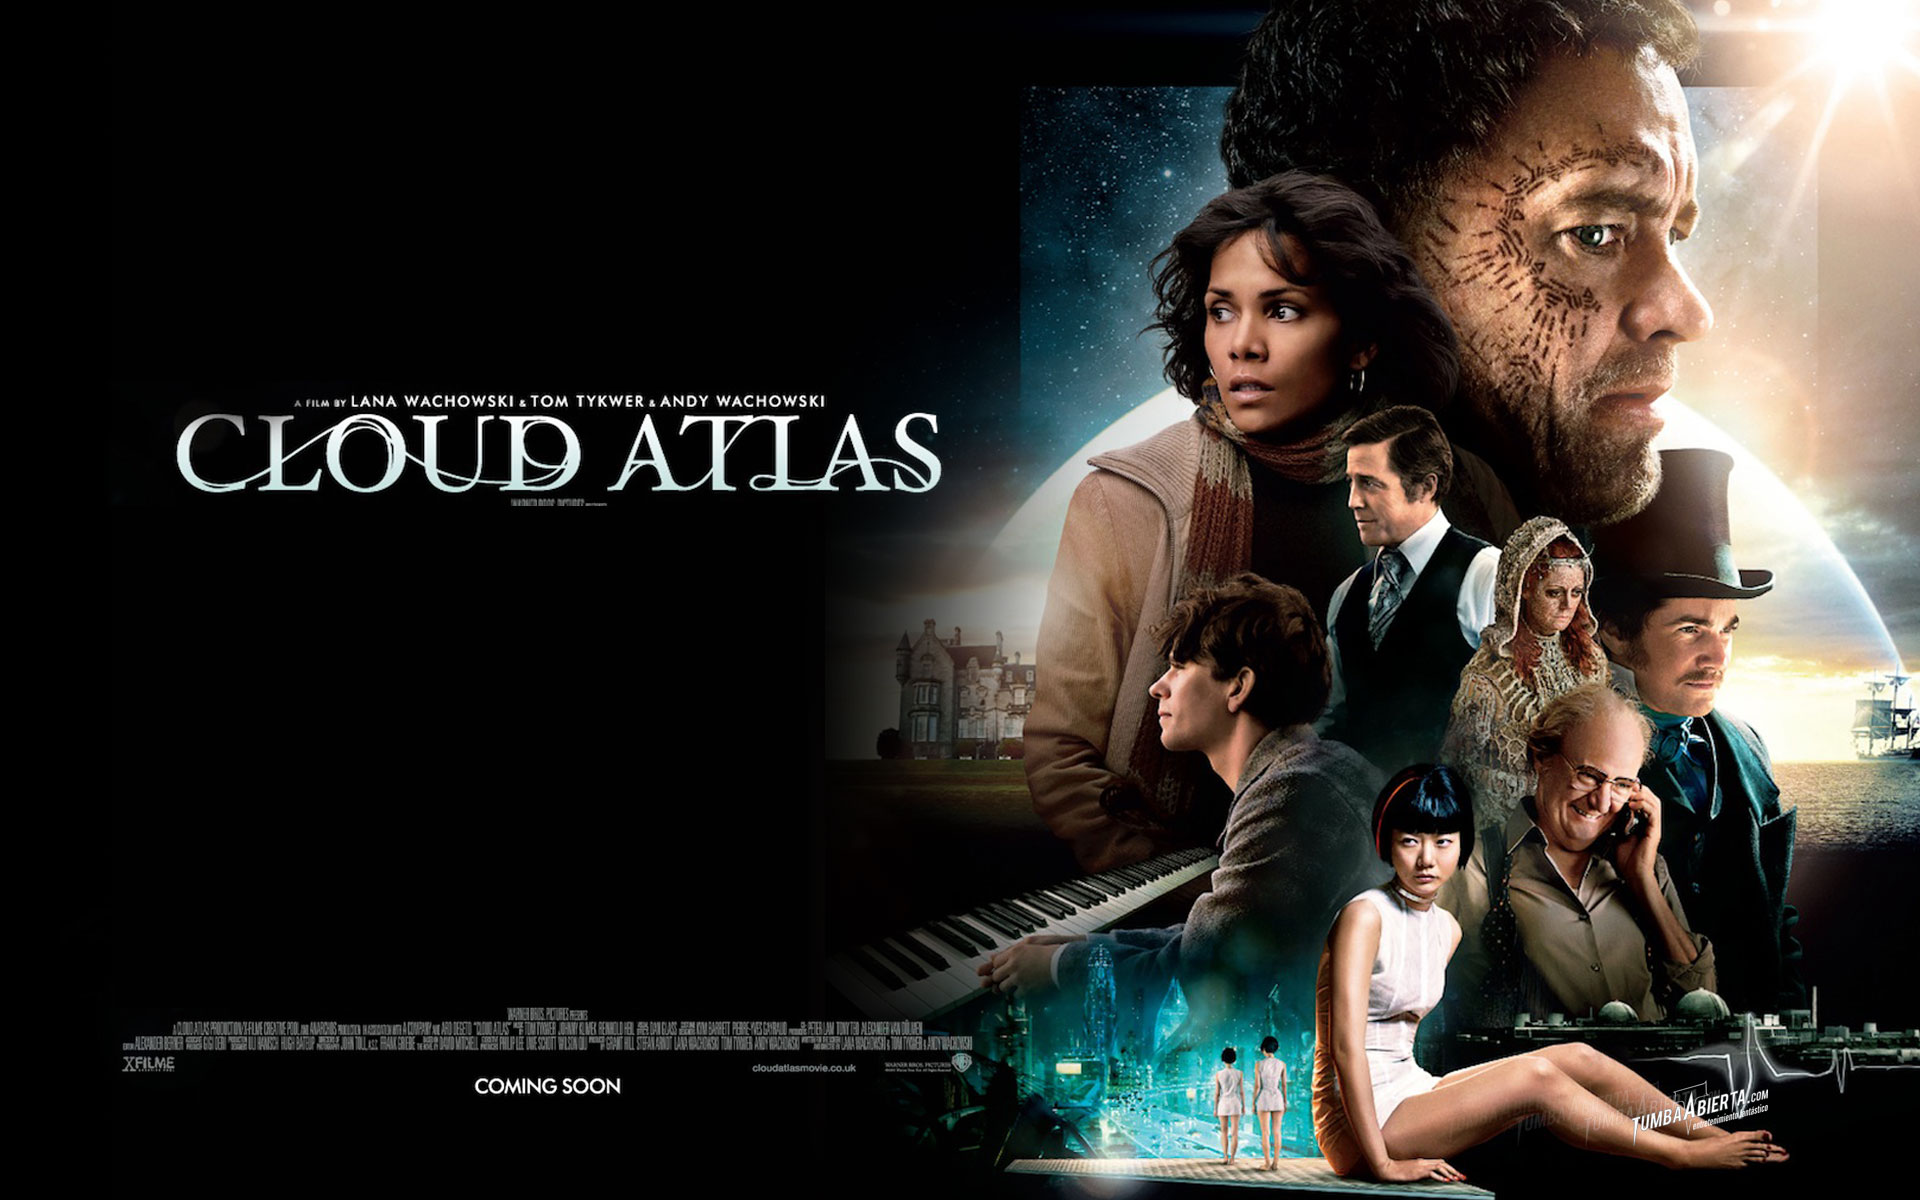 Cloud Atlas Wallpaper